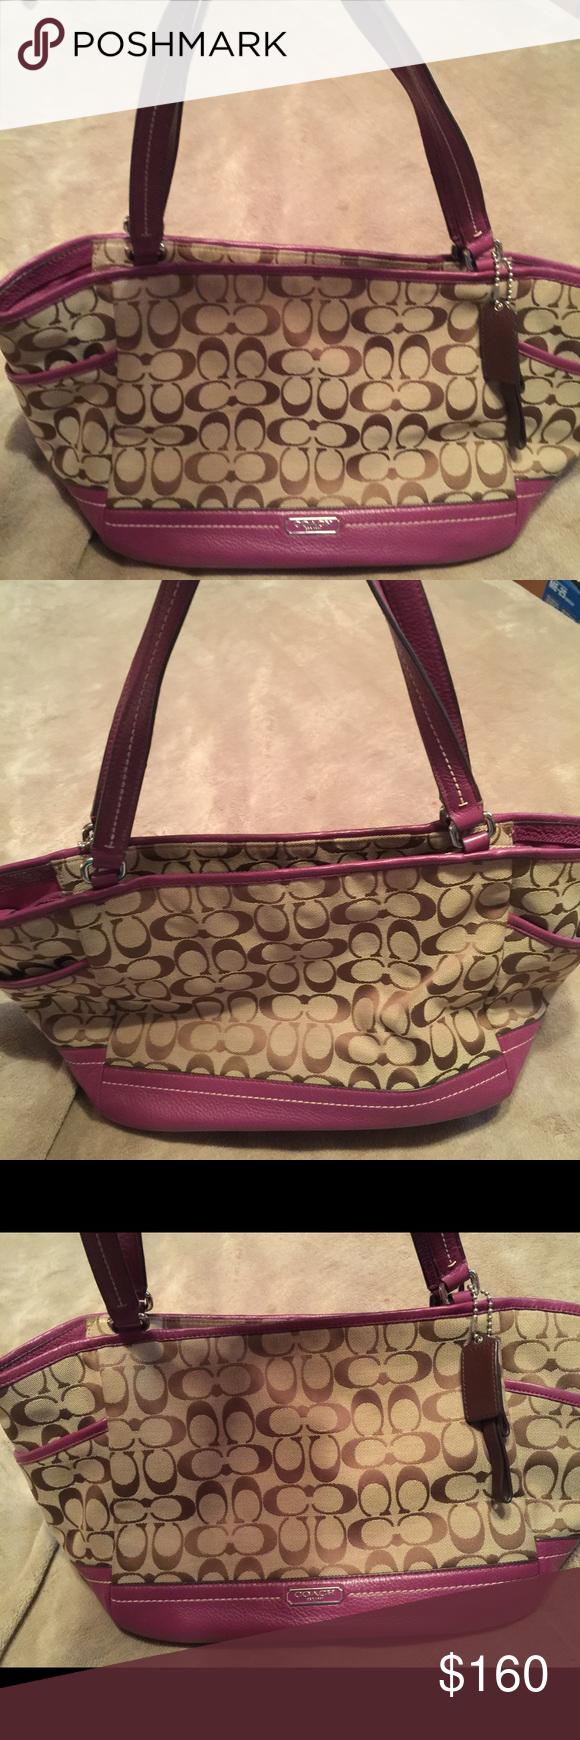 Coach handbag Coach handbag with very little use Coach Bags Shoulder Bags